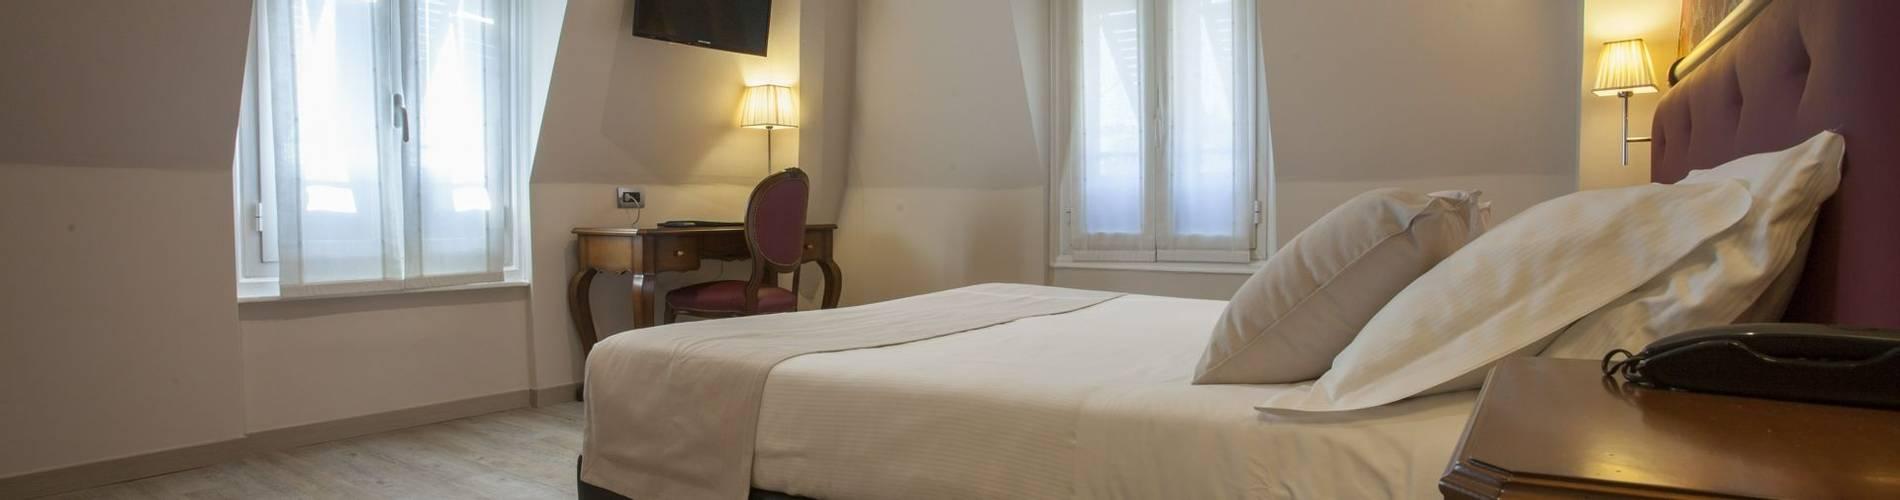 hotel_astoria_rapallo_DBS.jpg